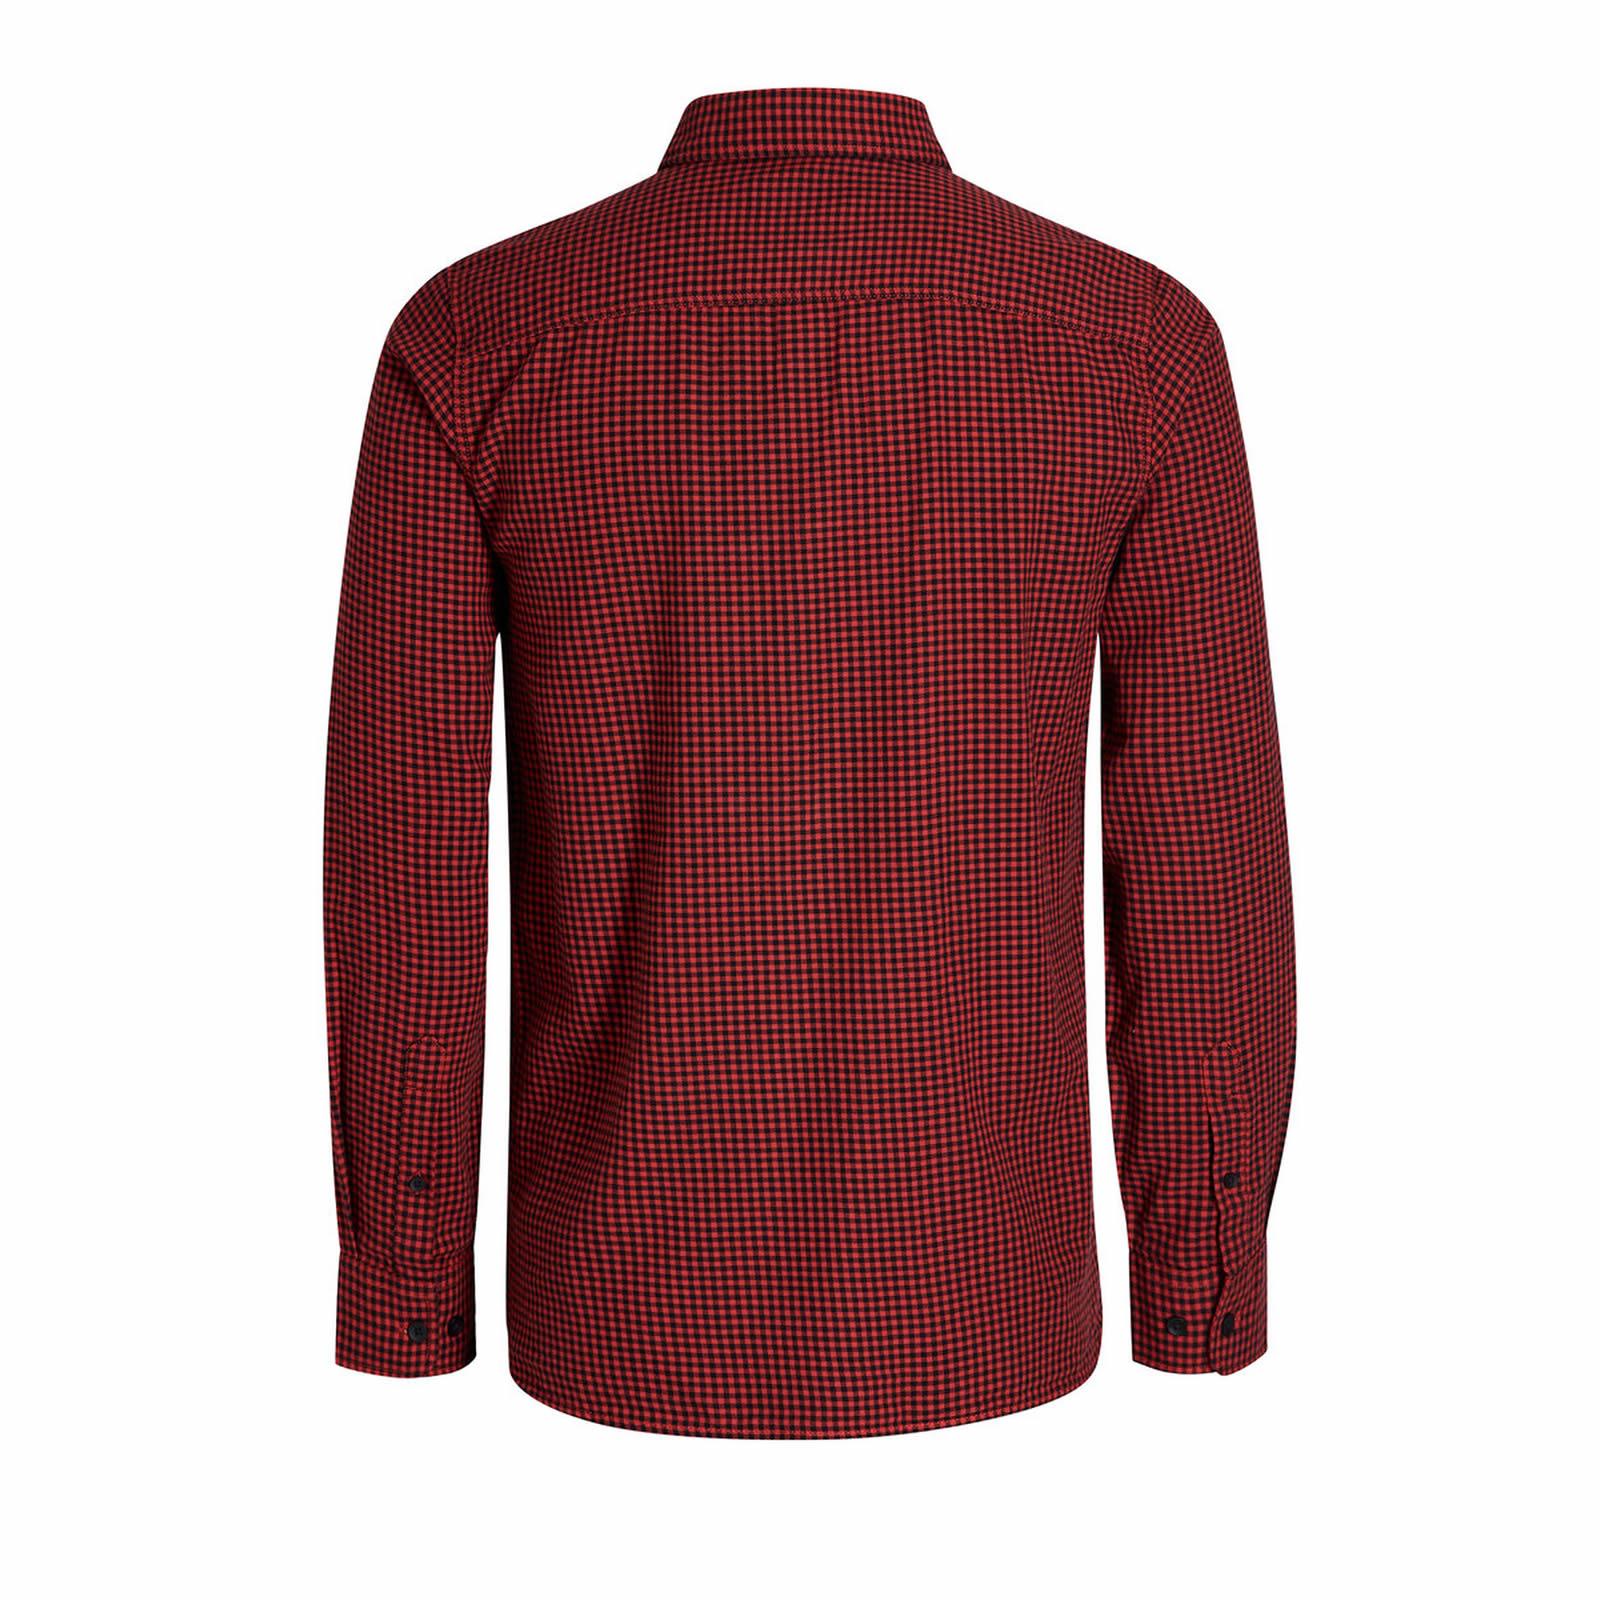 Mens-Check-Shirt-JACK-amp-JONES-Johan-Long-Sleeve-Collared-Cotton-Casual-Shirt thumbnail 3